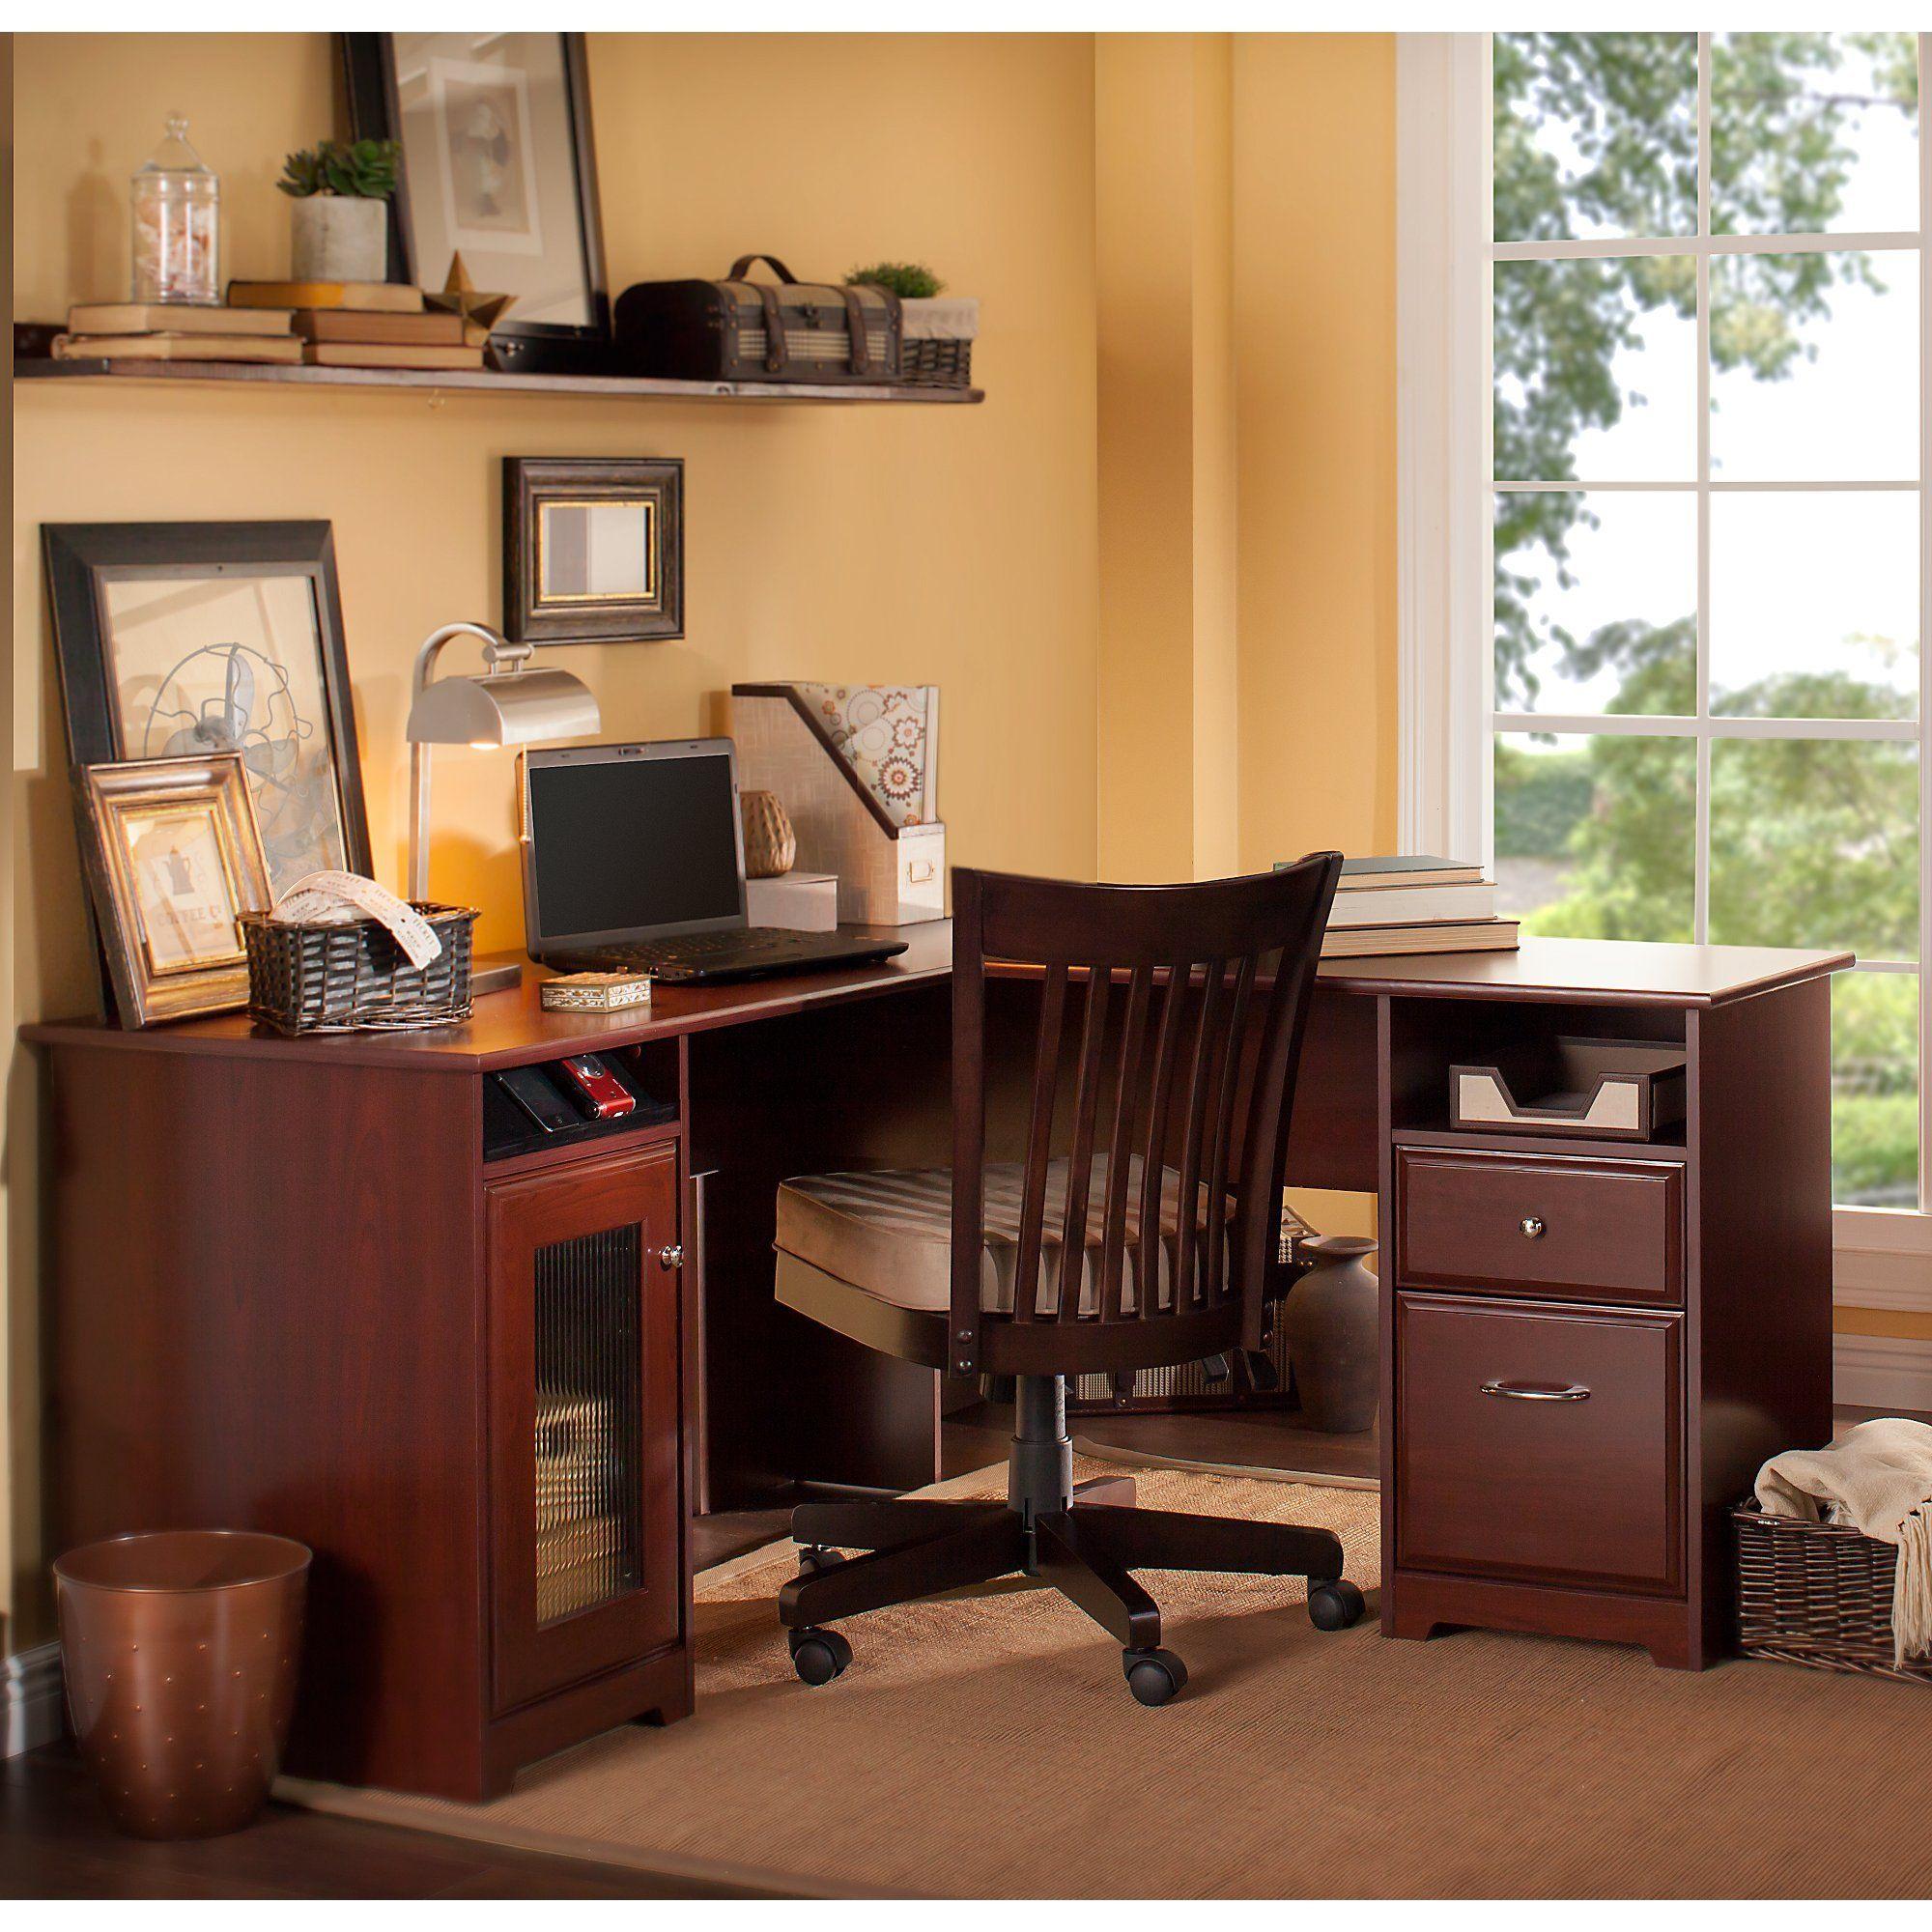 Bush furniture cabot l shaped desk in harvest cherry affiliate